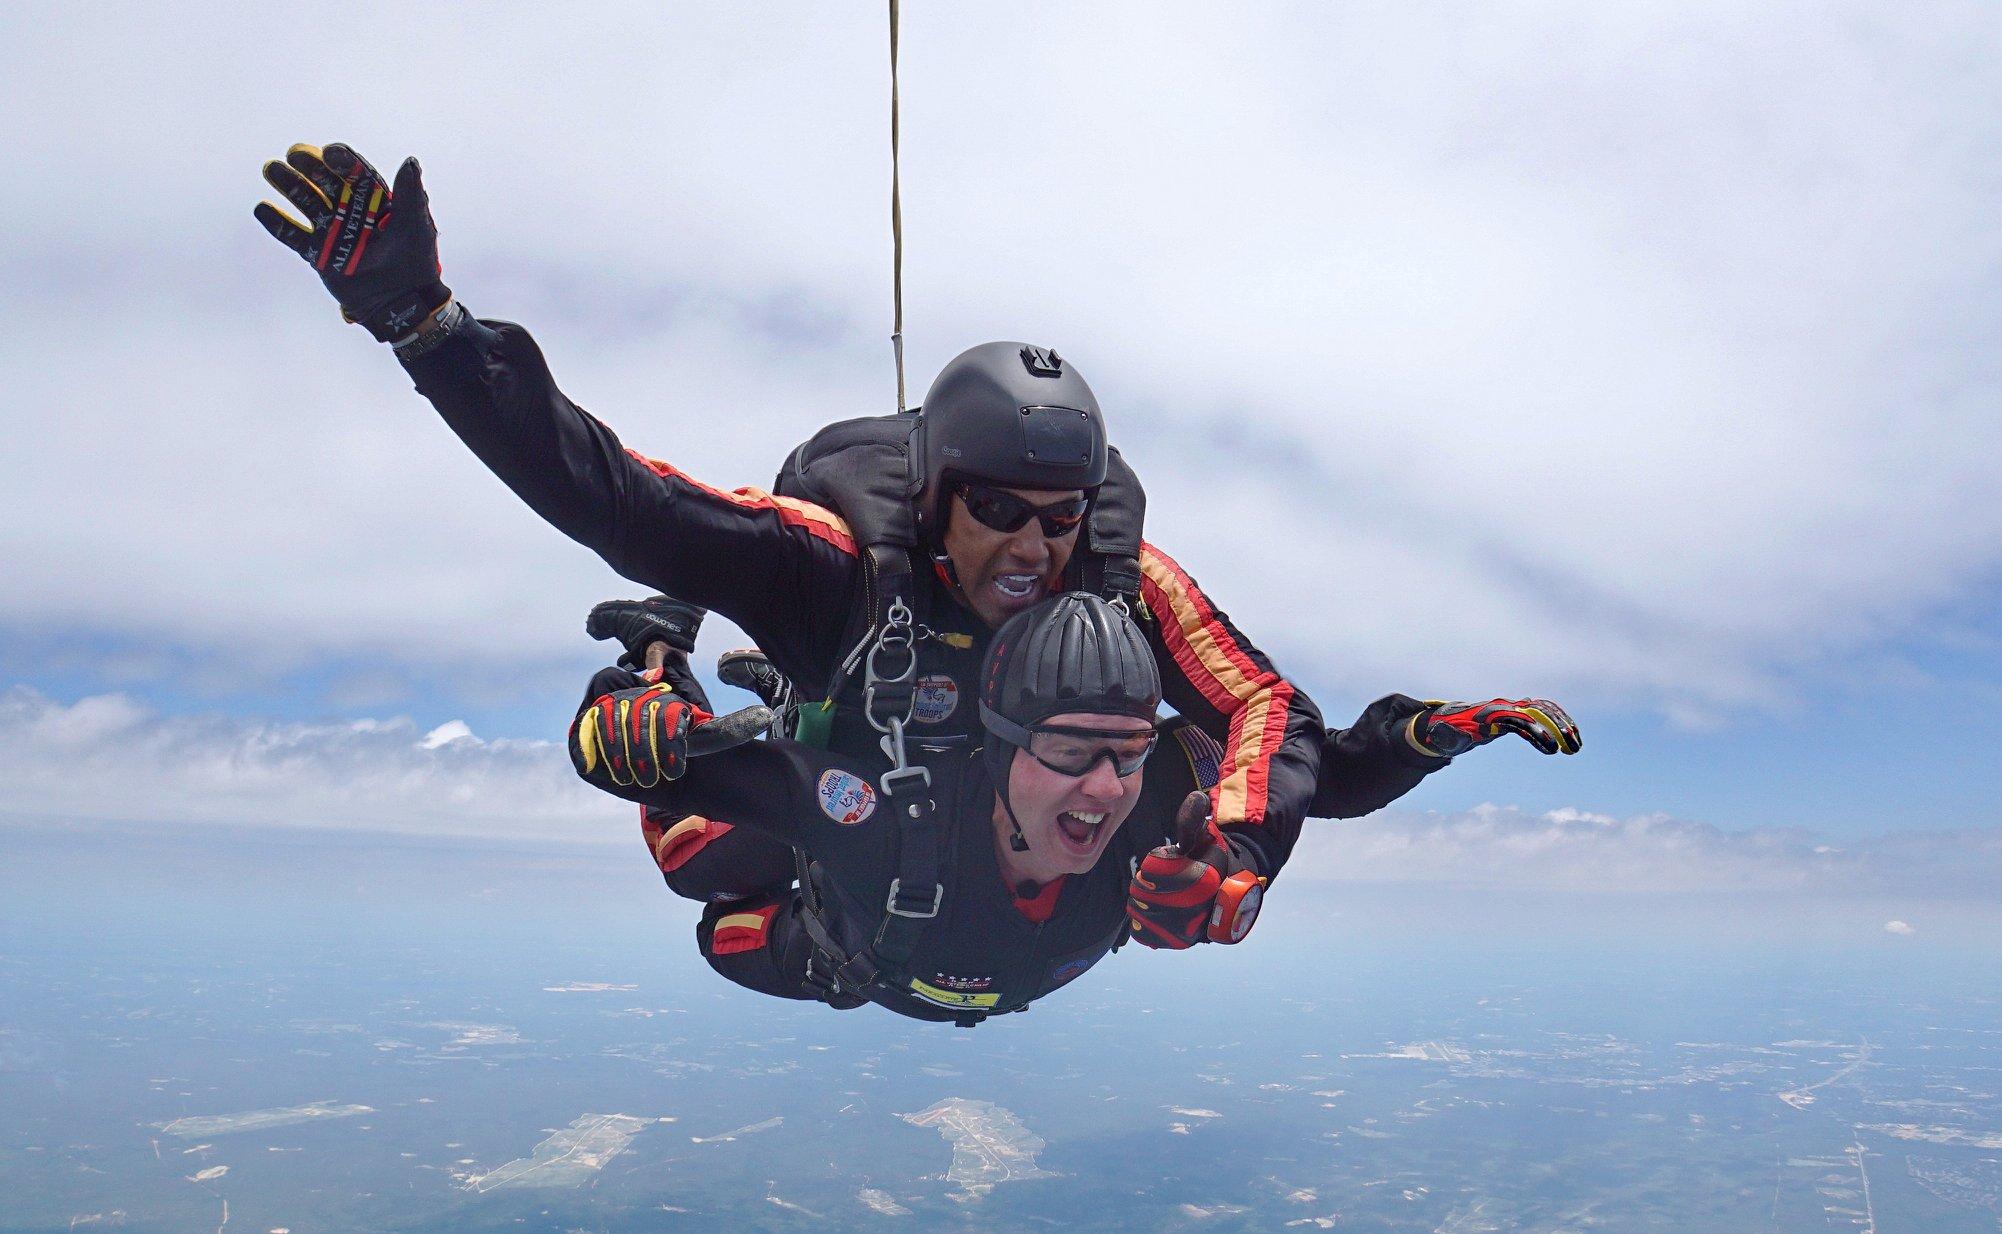 Brigham Surgeons Arrange Skydiving Experience for Patient